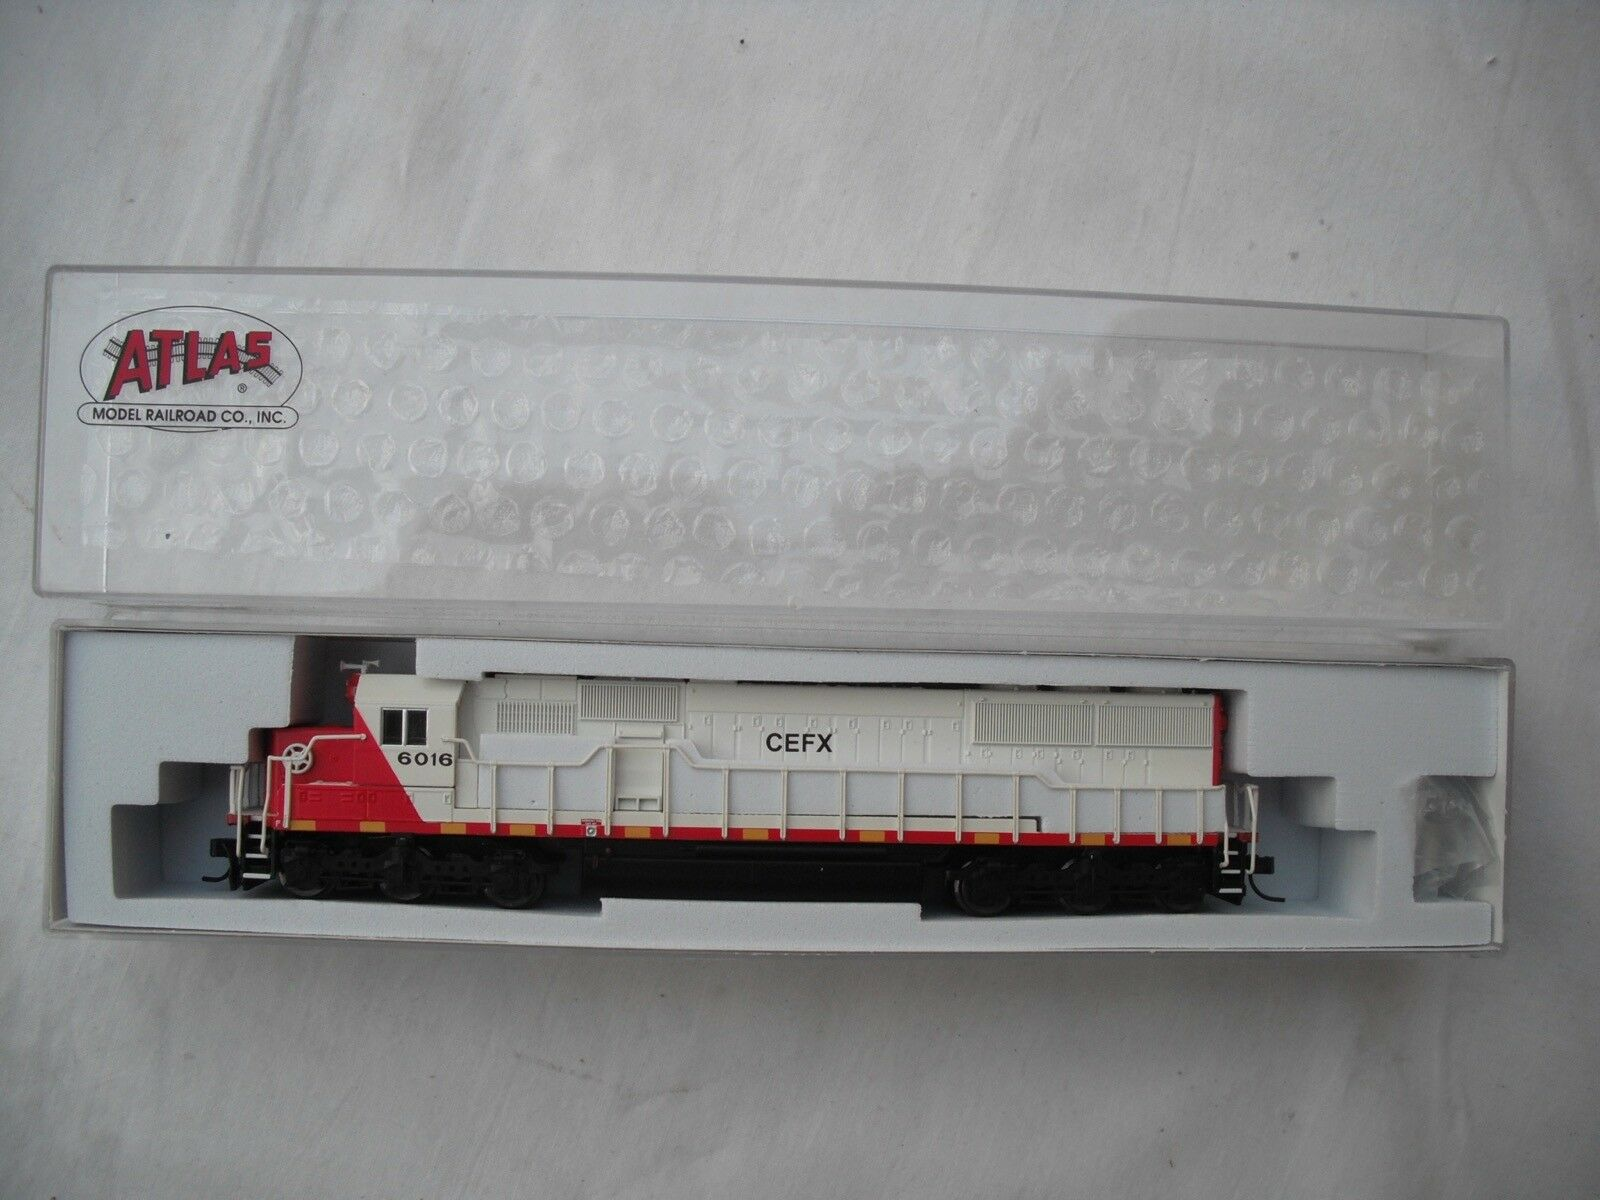 Atlas 49140 SD-60 SD60, CEFX Leasing 6016, DCC, Diesel Locomotive Engine,N Scale